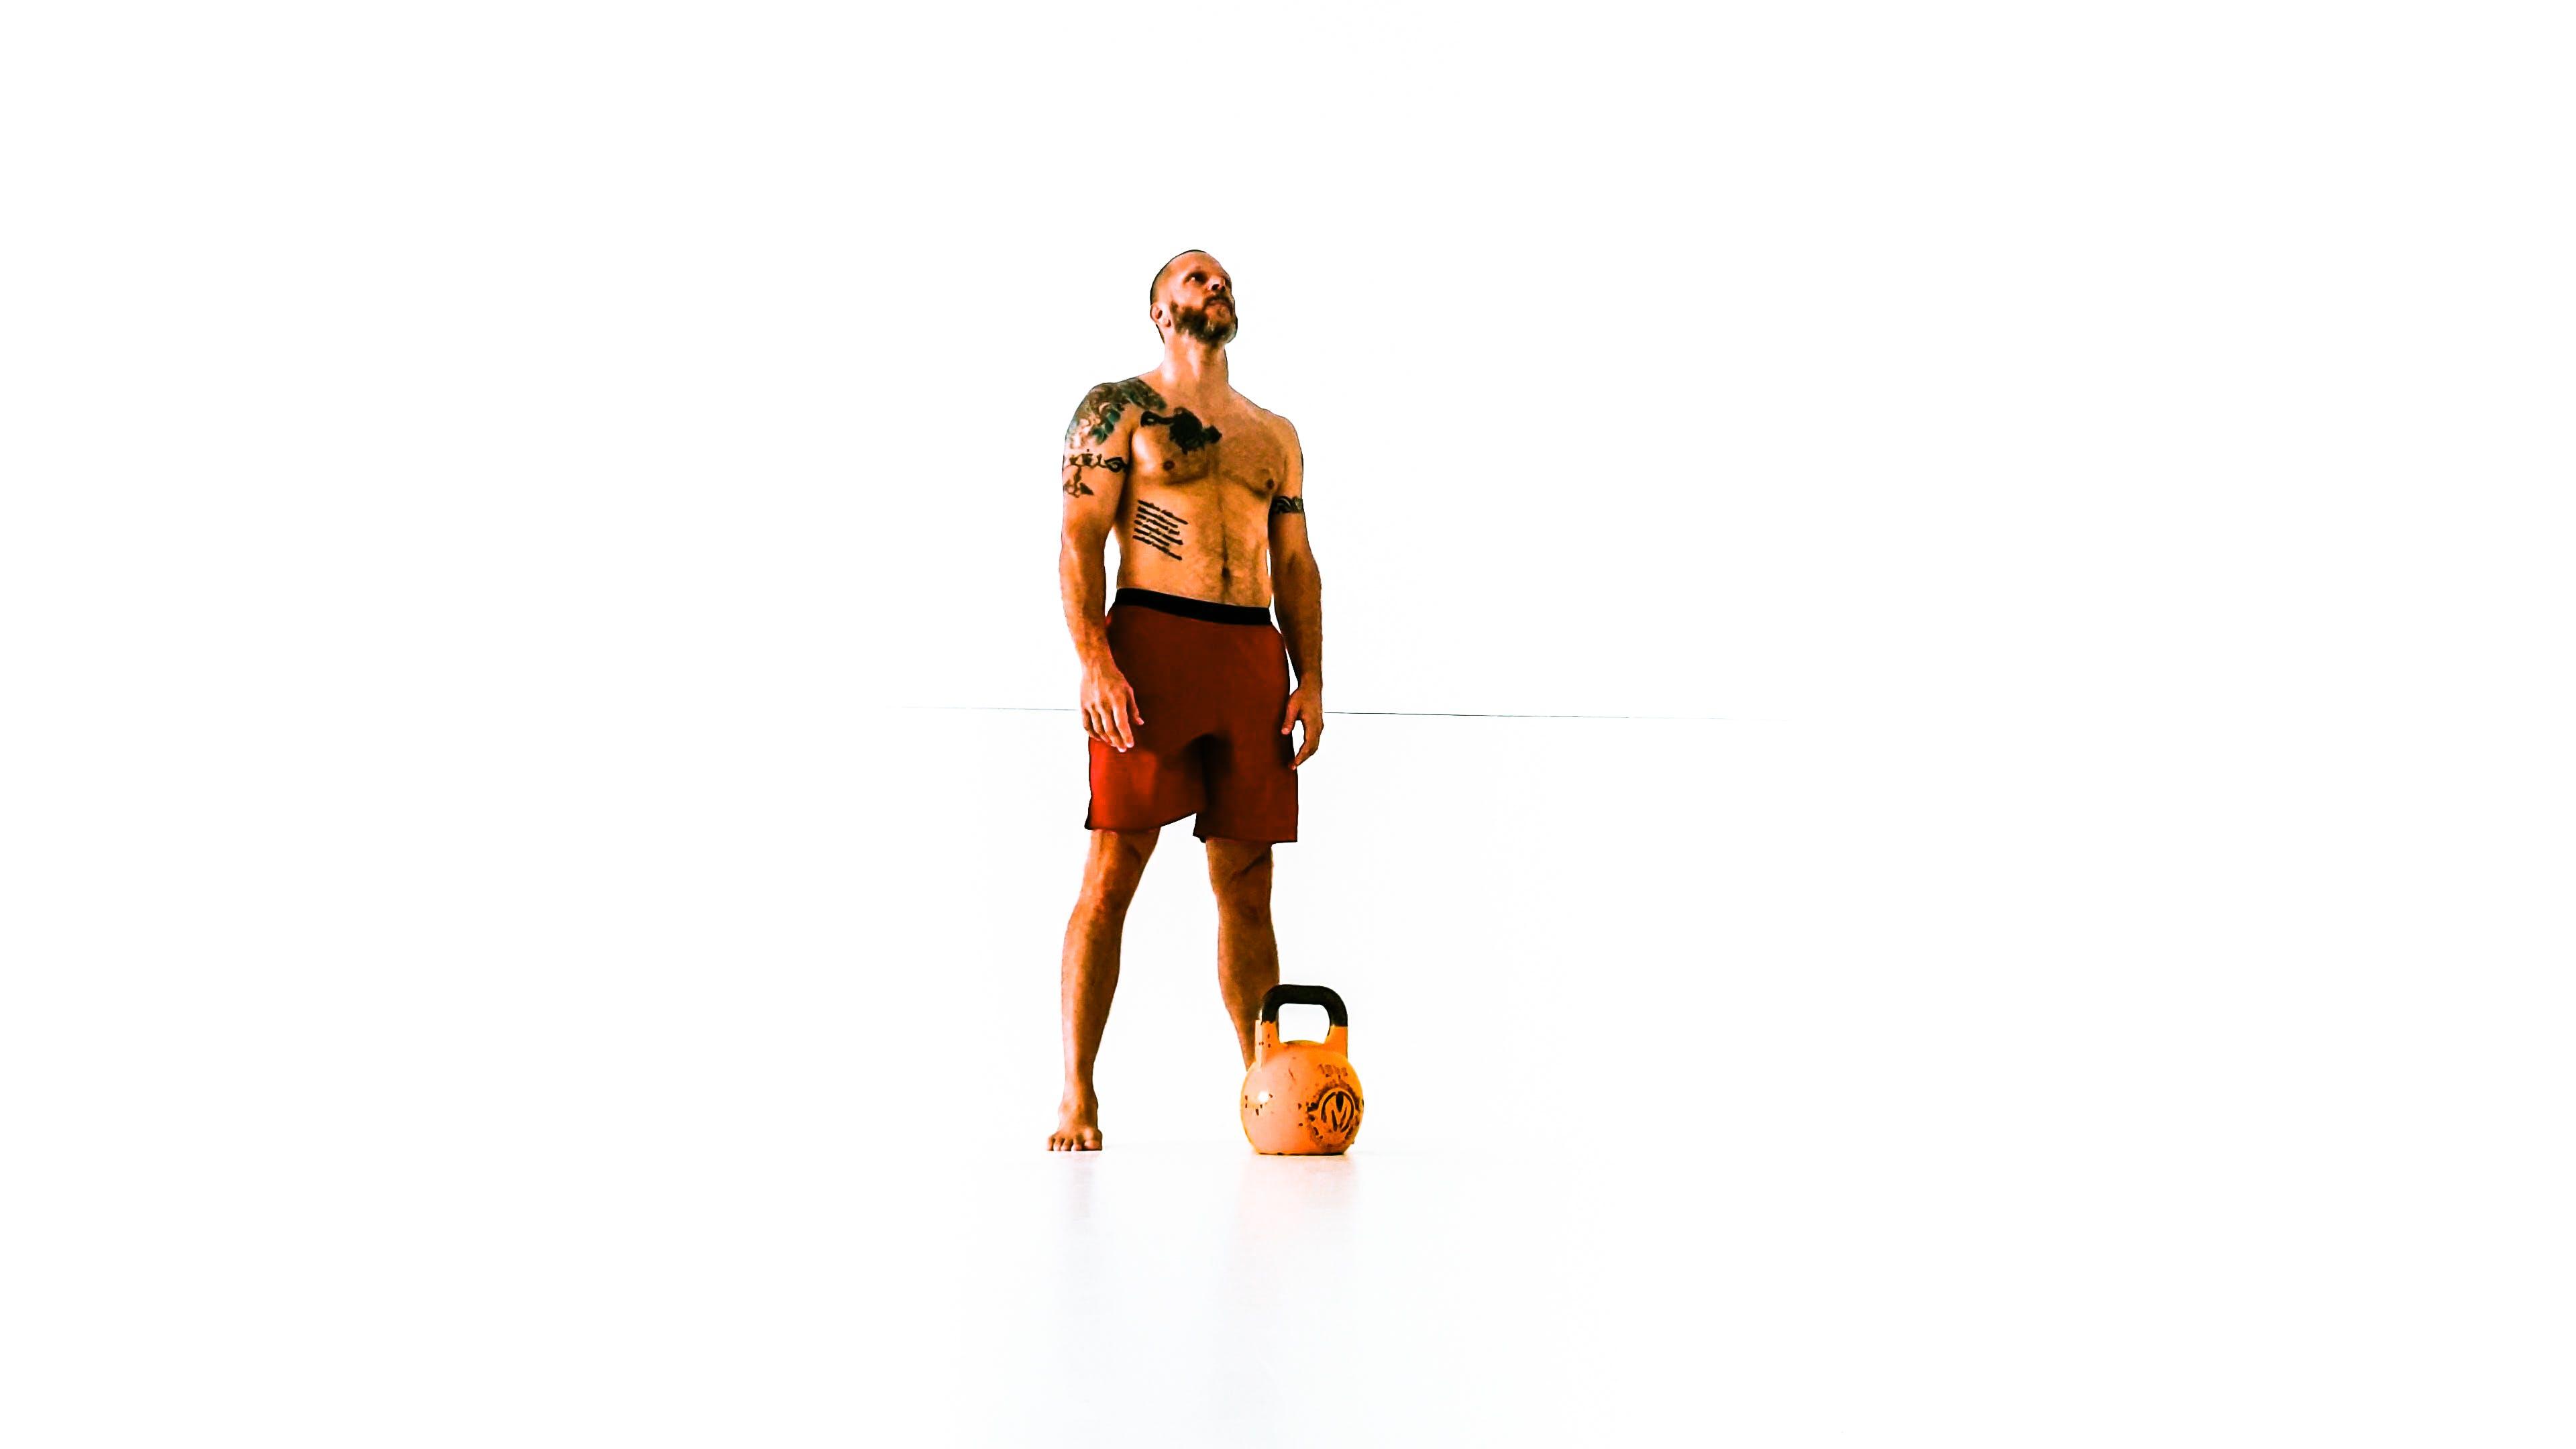 Free stock photo of cavemantraining, crossfit, exercise, fitness